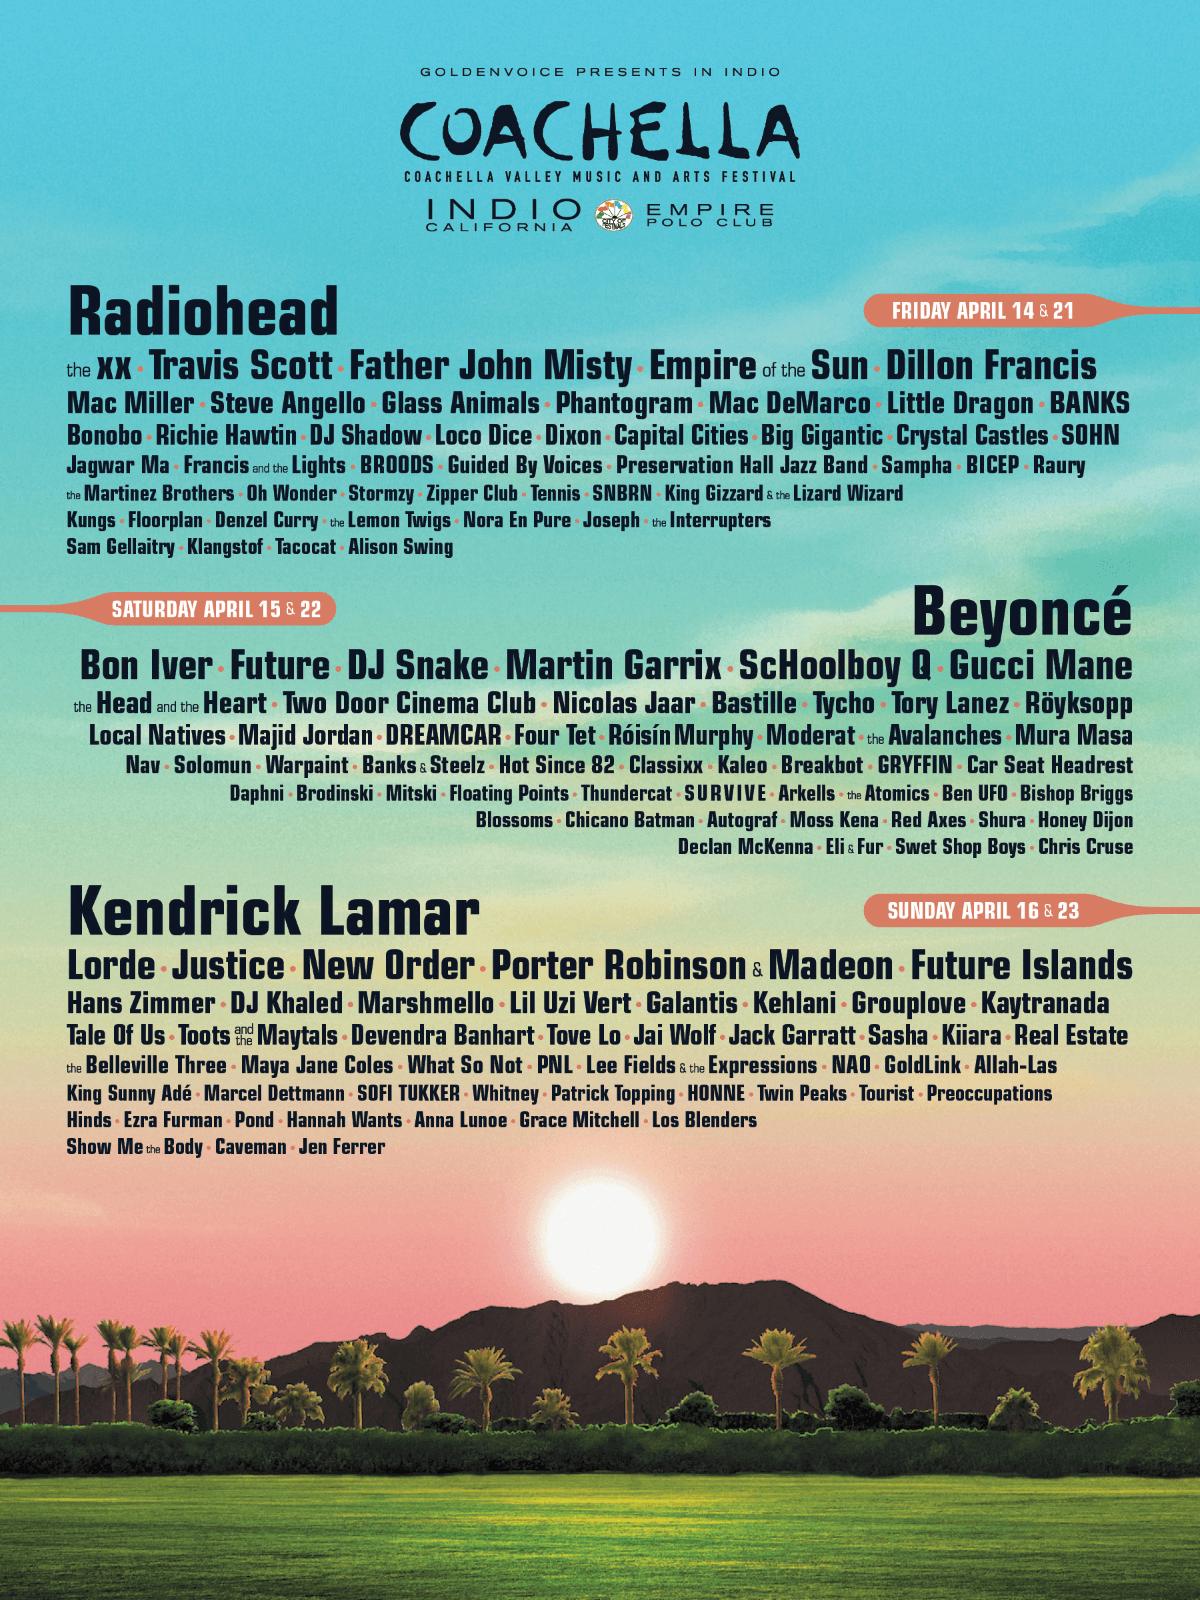 Line-up do Coachella 2017